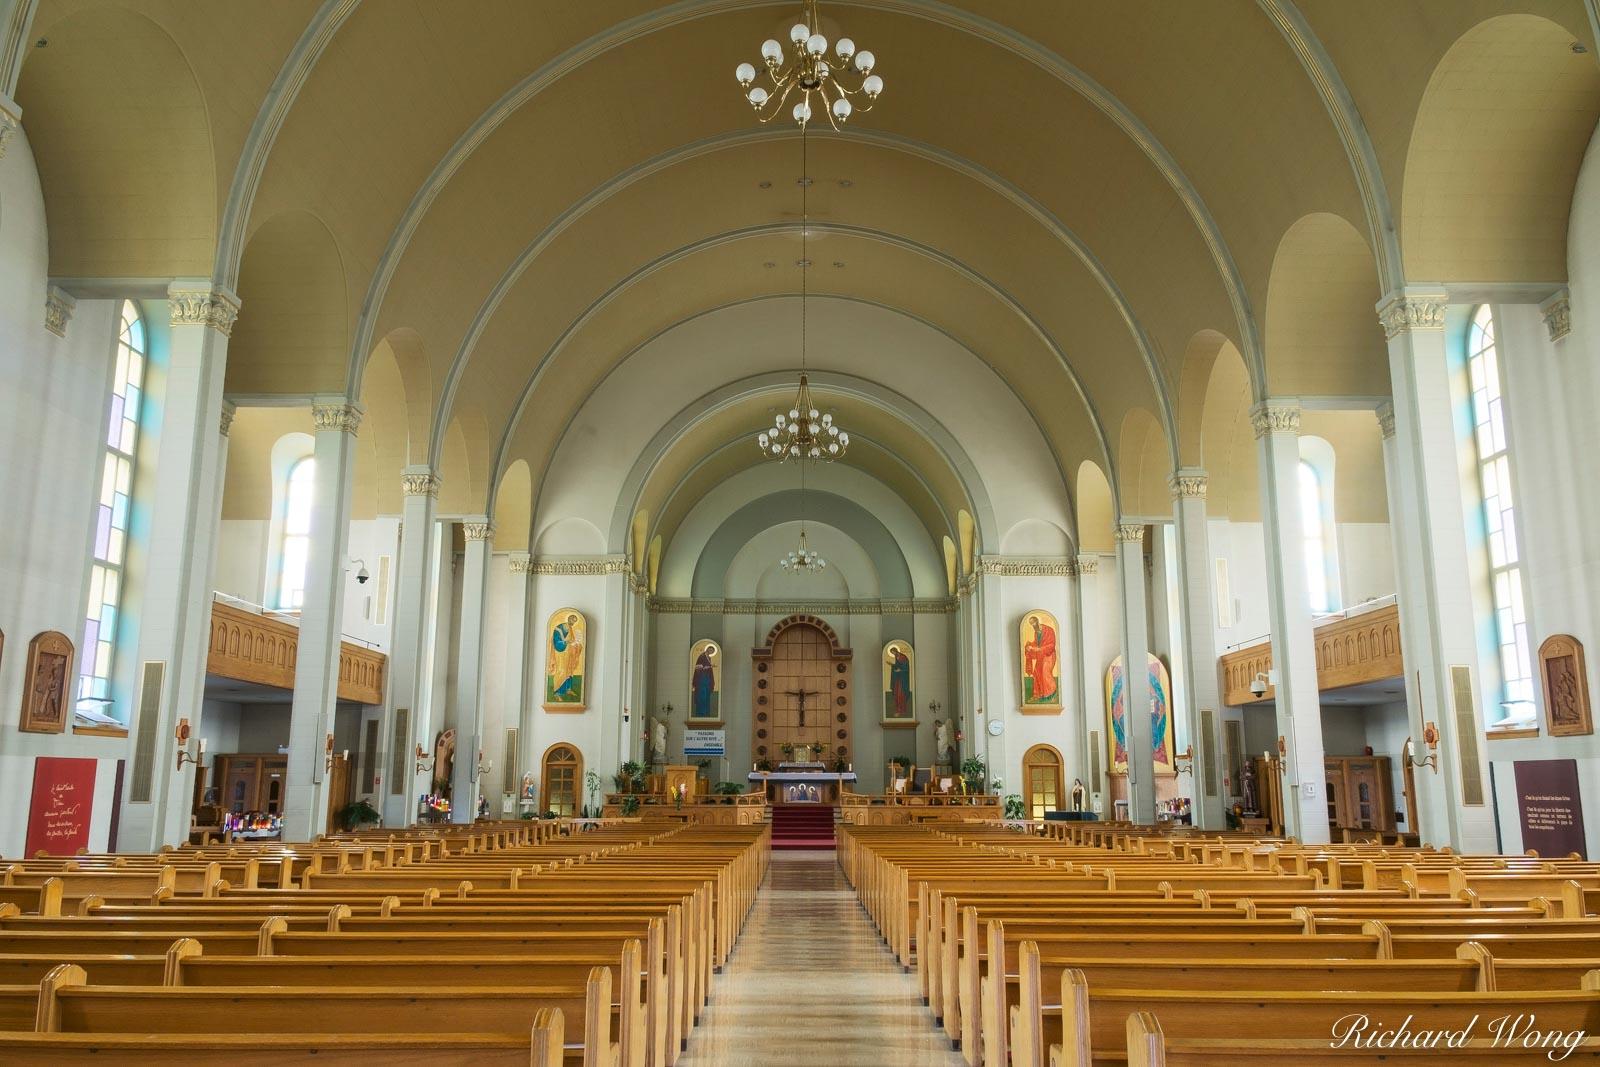 Baie-Saint-Paul Church Interior, Charlevoix, Quebec, Canada, photo, photo